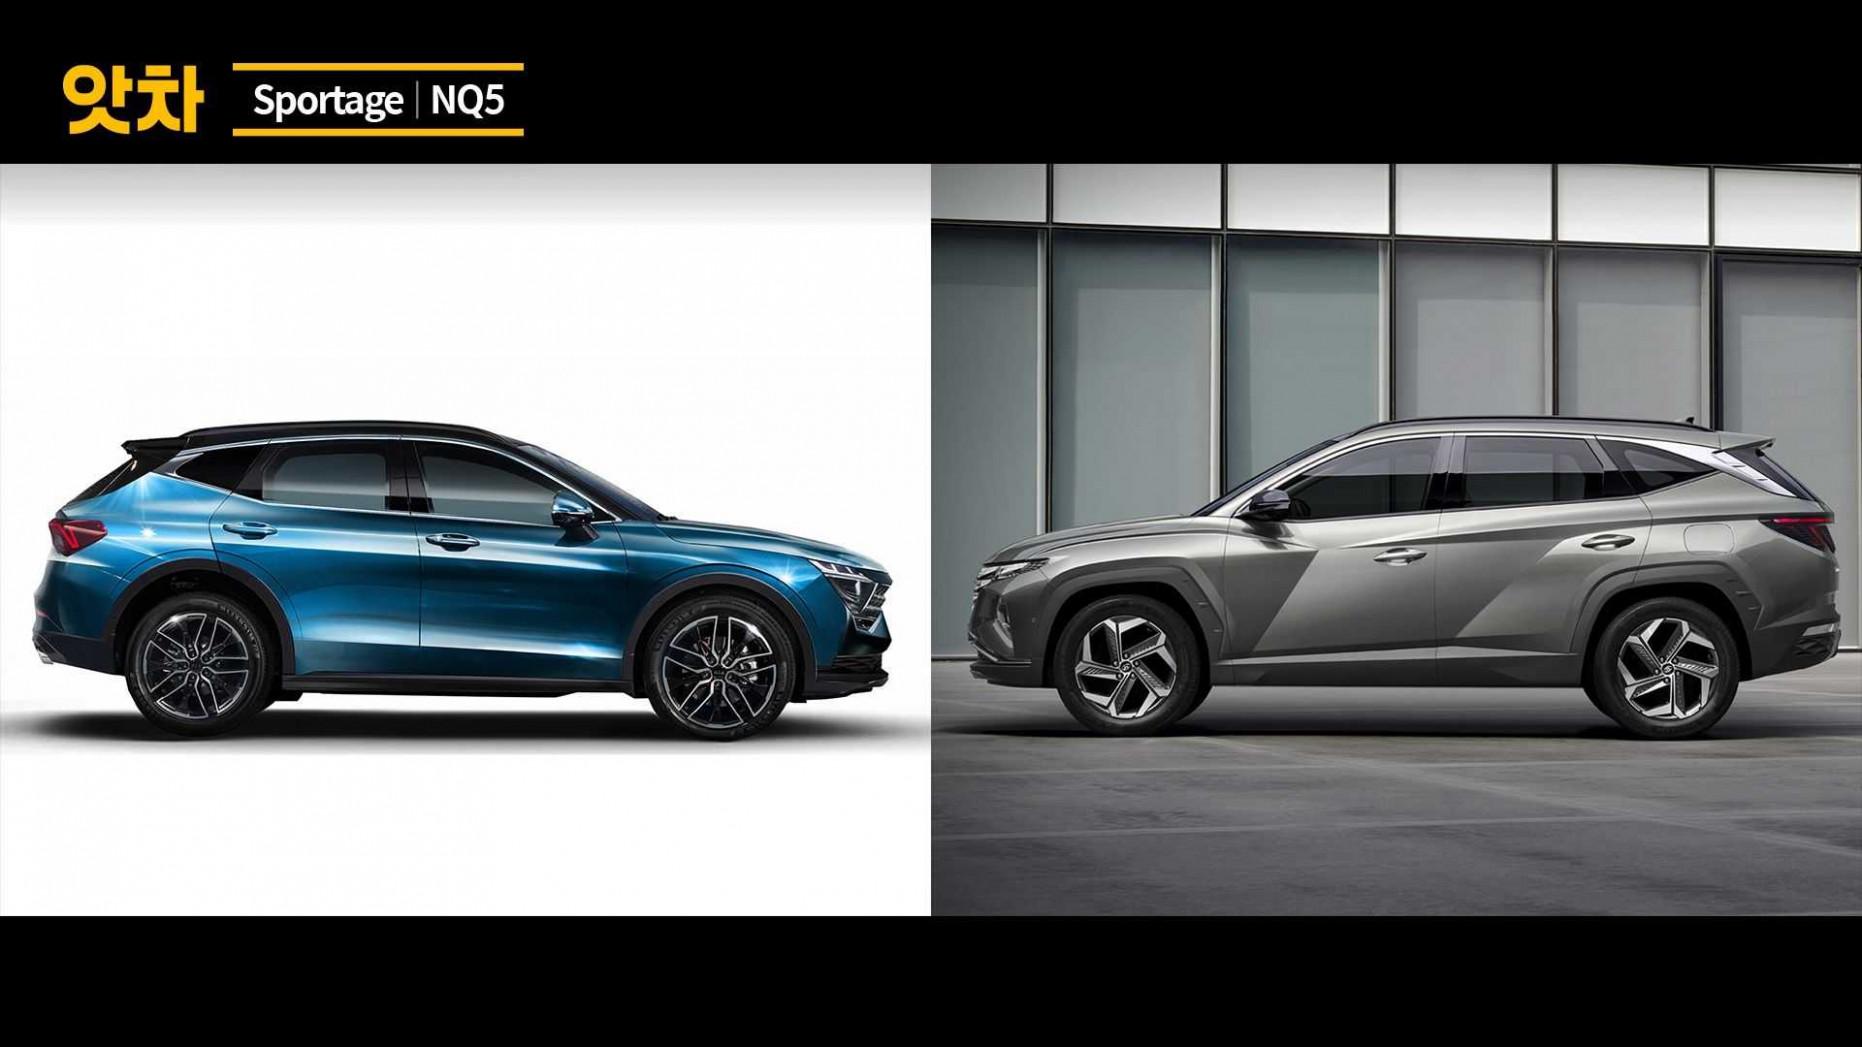 Release Date and Concept Kia Sportage 2022 Model